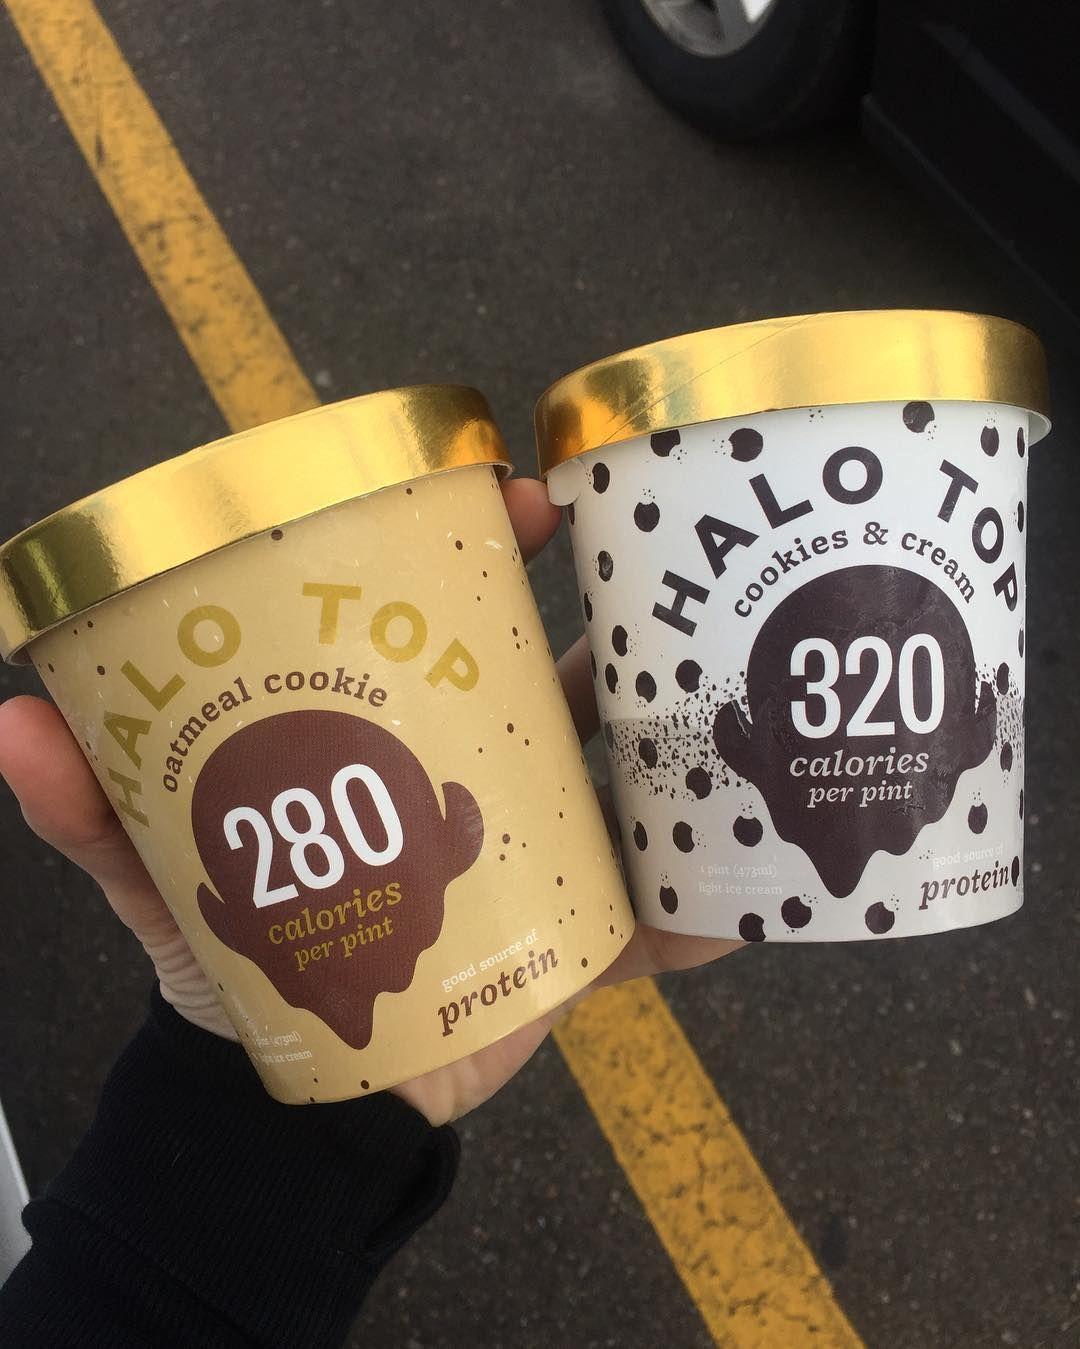 Dairy Ice Cream Flavors Ice Cream Flavors Flavors Healthy Ice